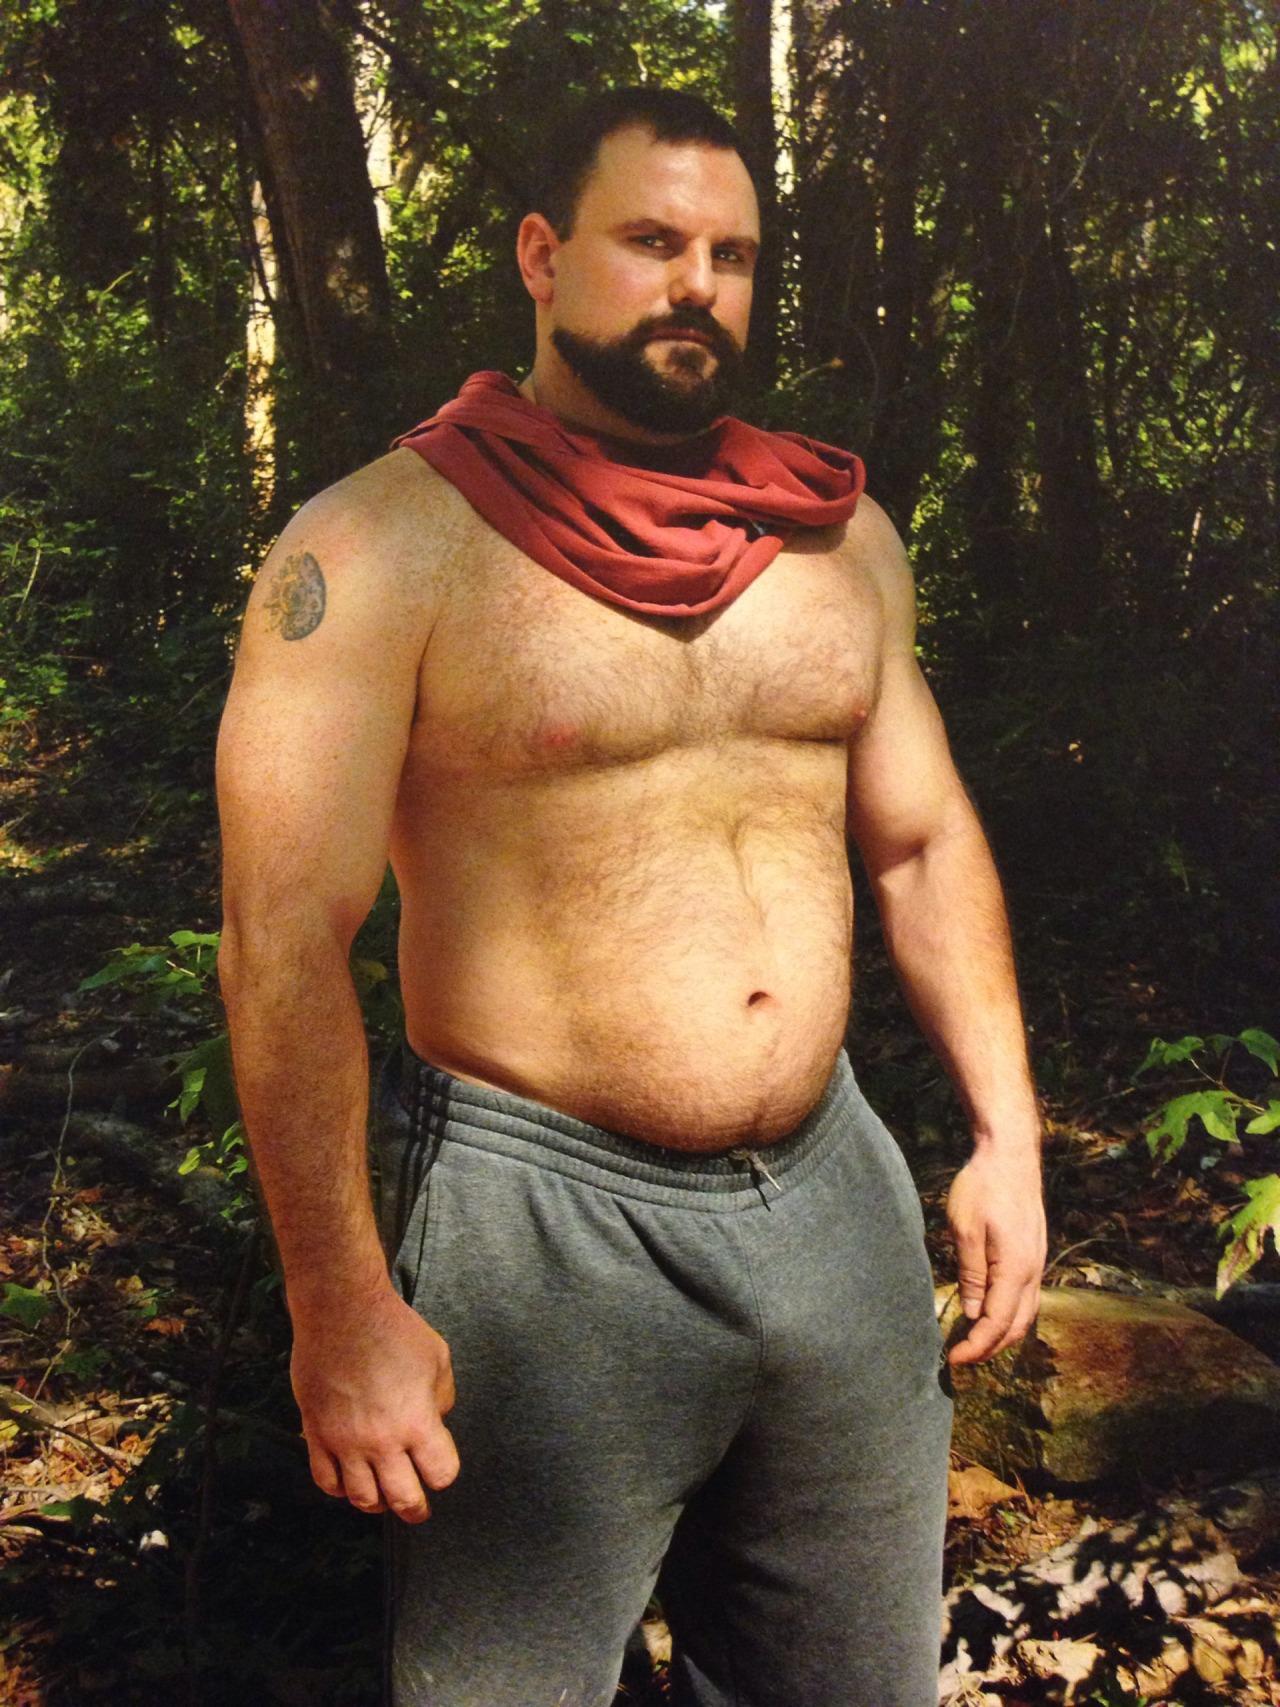 Hairy muscle bear men naked